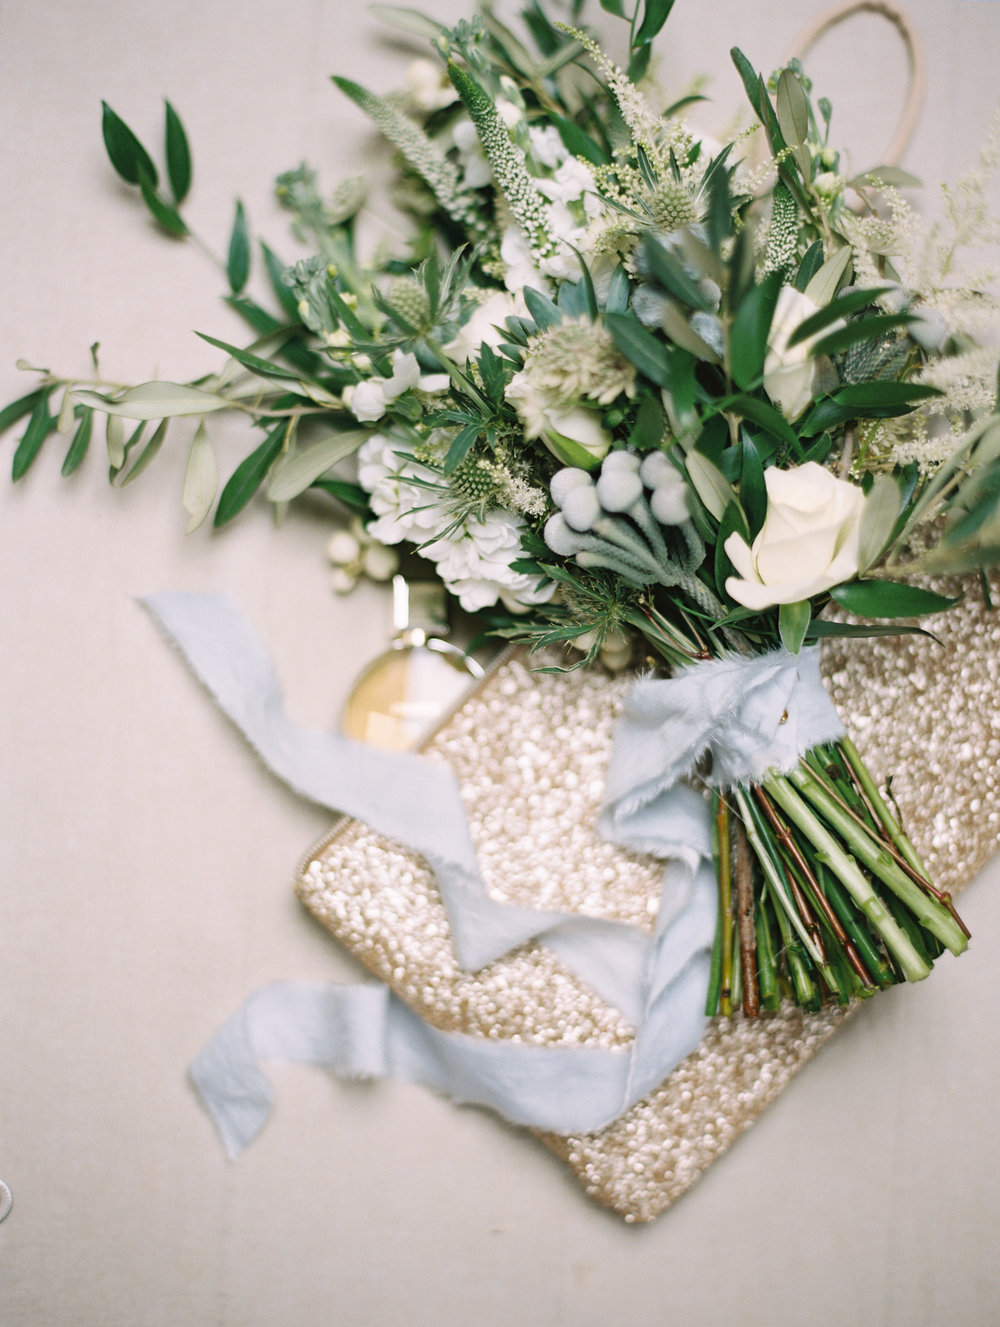 011-fine-art-film-photographer-destination-wedding-ireland-brumley & wells.jpg